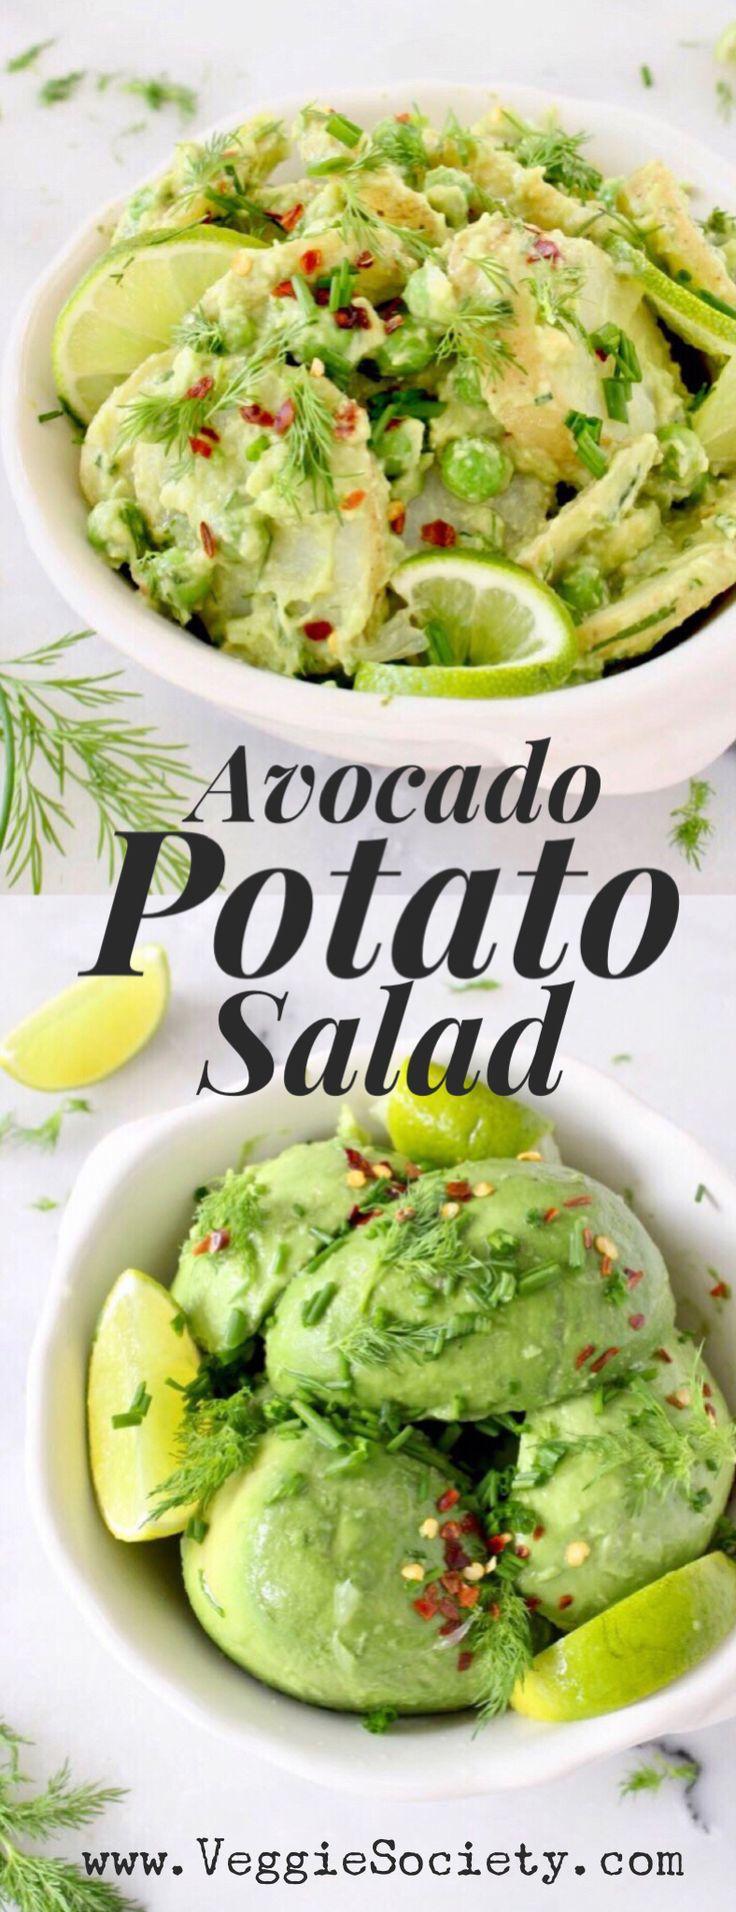 Healthy, Vegan Avocado Potato Salad Recipe with Dill and Citrus Avocado Dressing | VeggieSociety.com @VeggieSociety #vegan #plantbased #potato #avocado